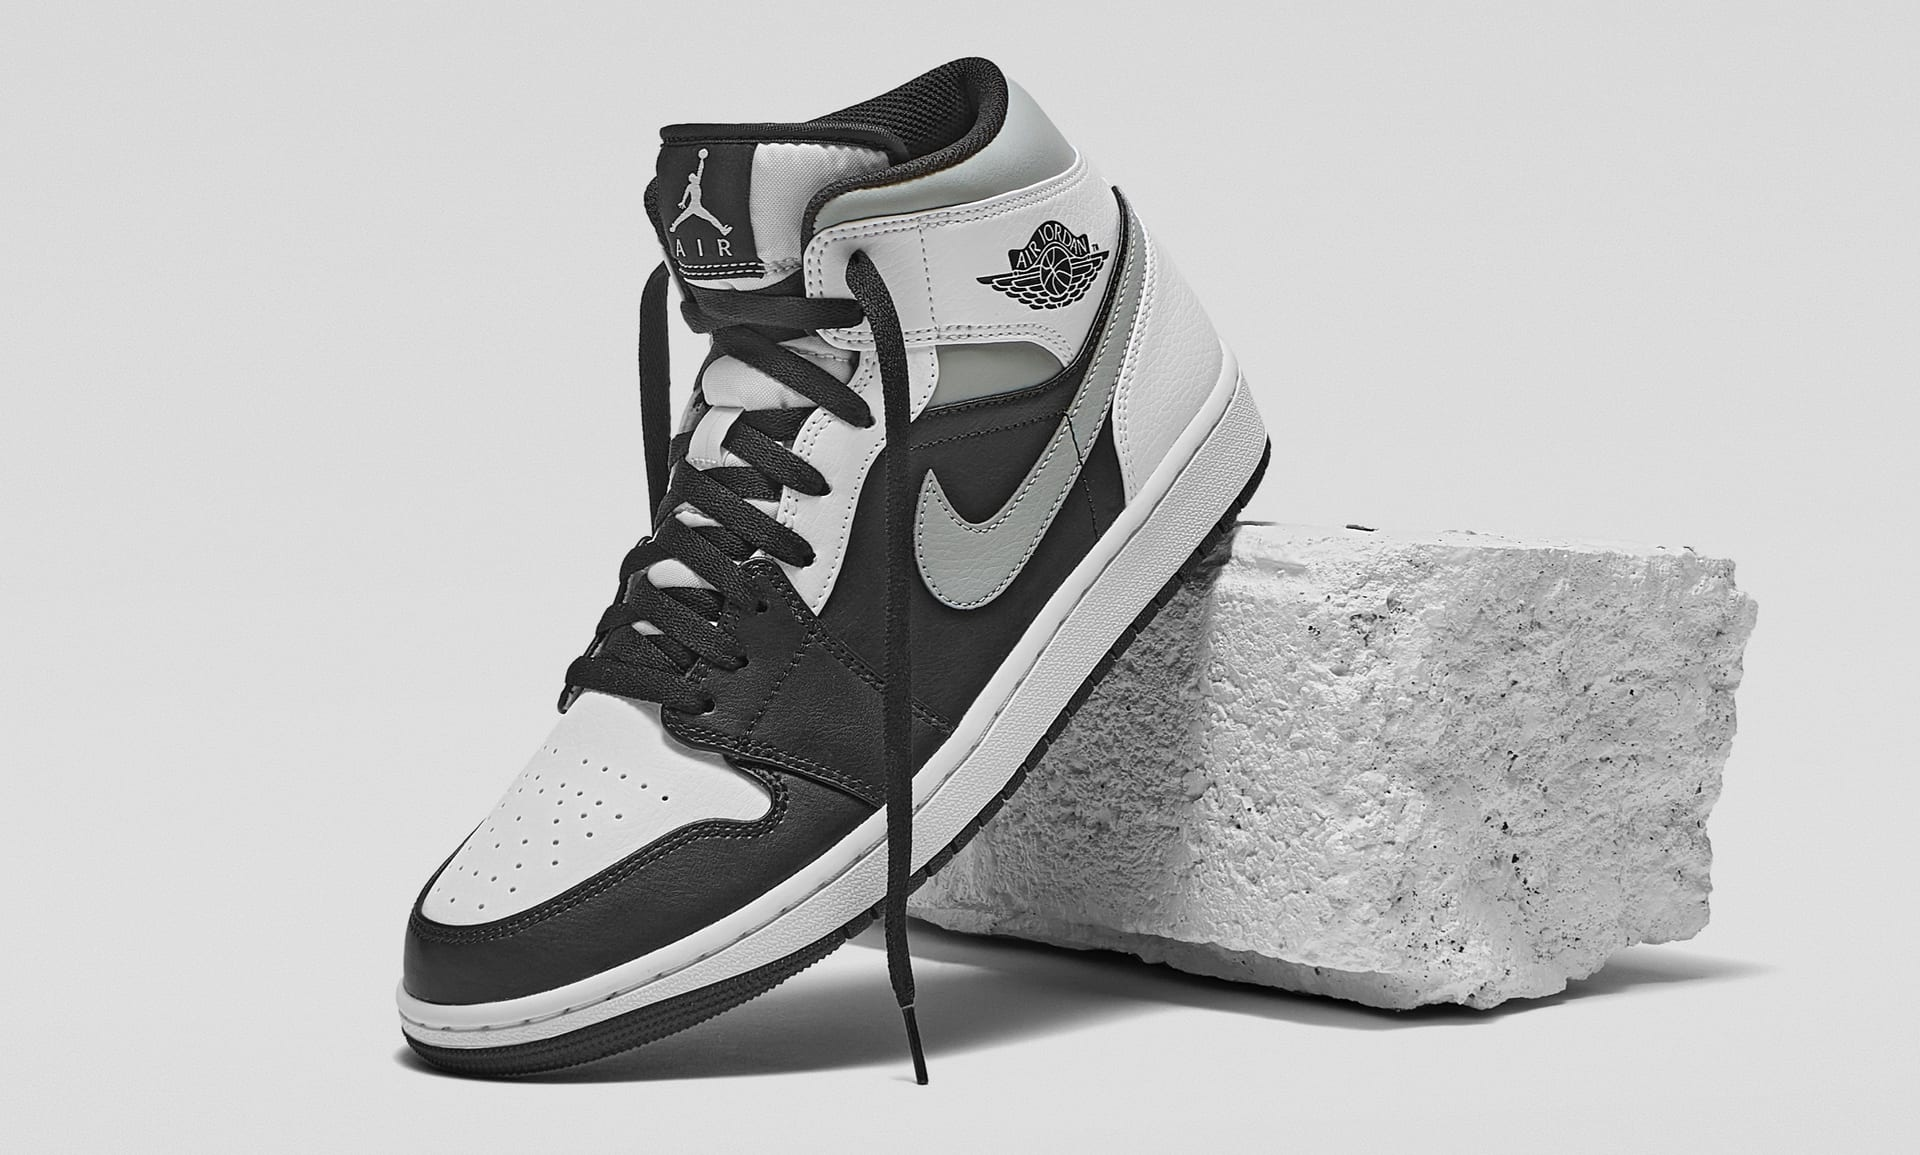 Obligar Tesauro Corrupto  Calzado Air Jordan 1 Mid. Nike MX